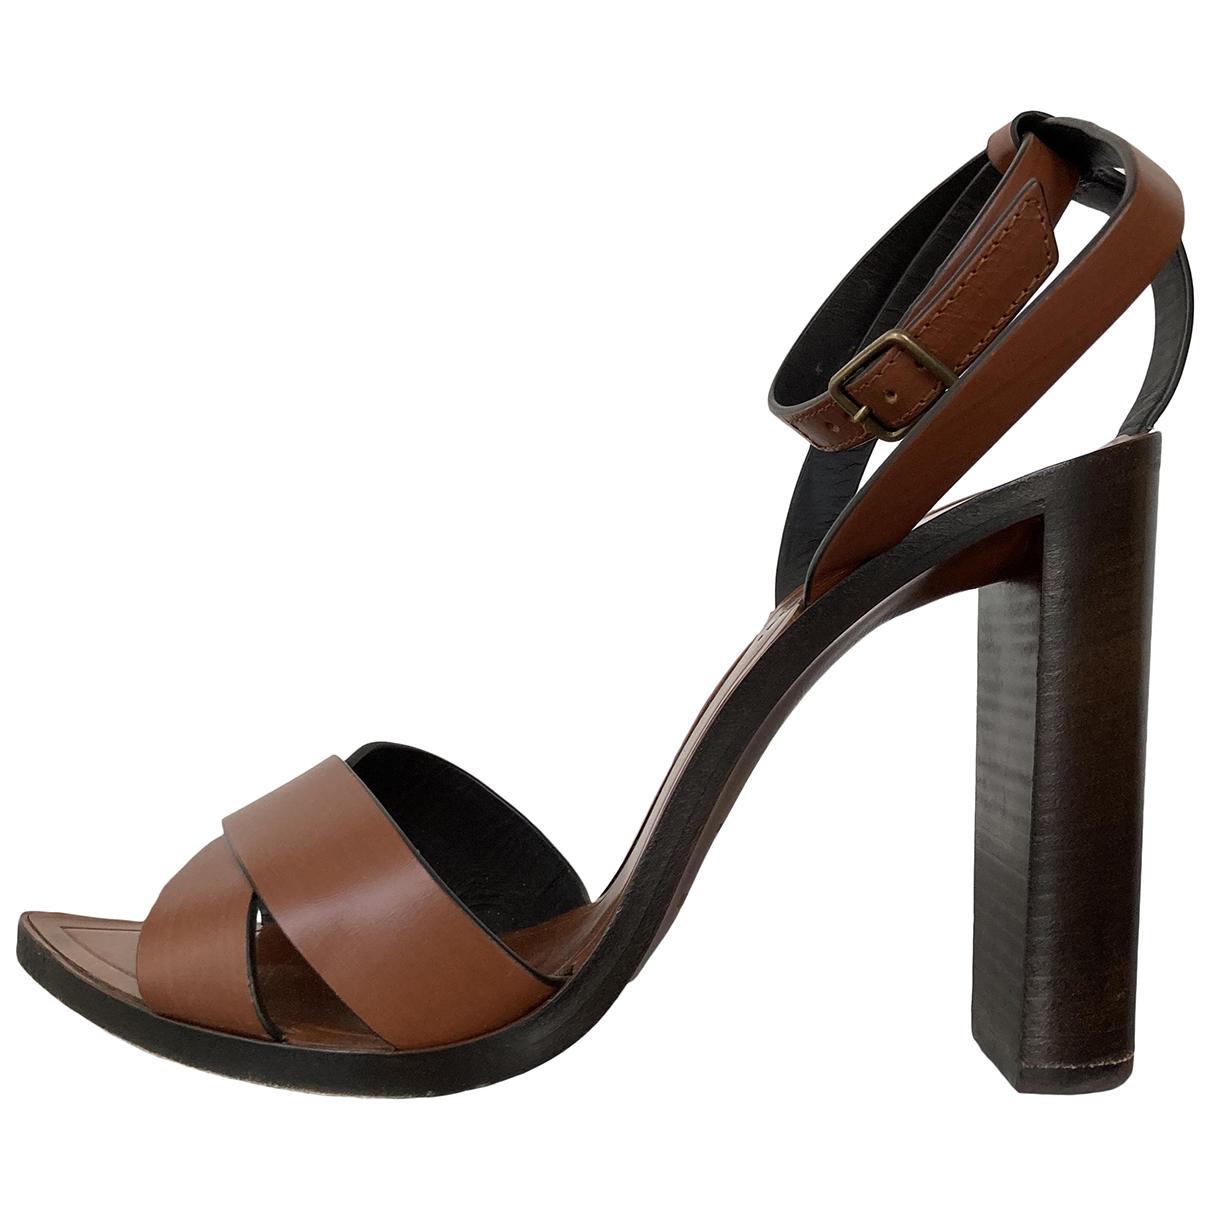 Saint Laurent N Brown Leather Sandals for Women 39 EU